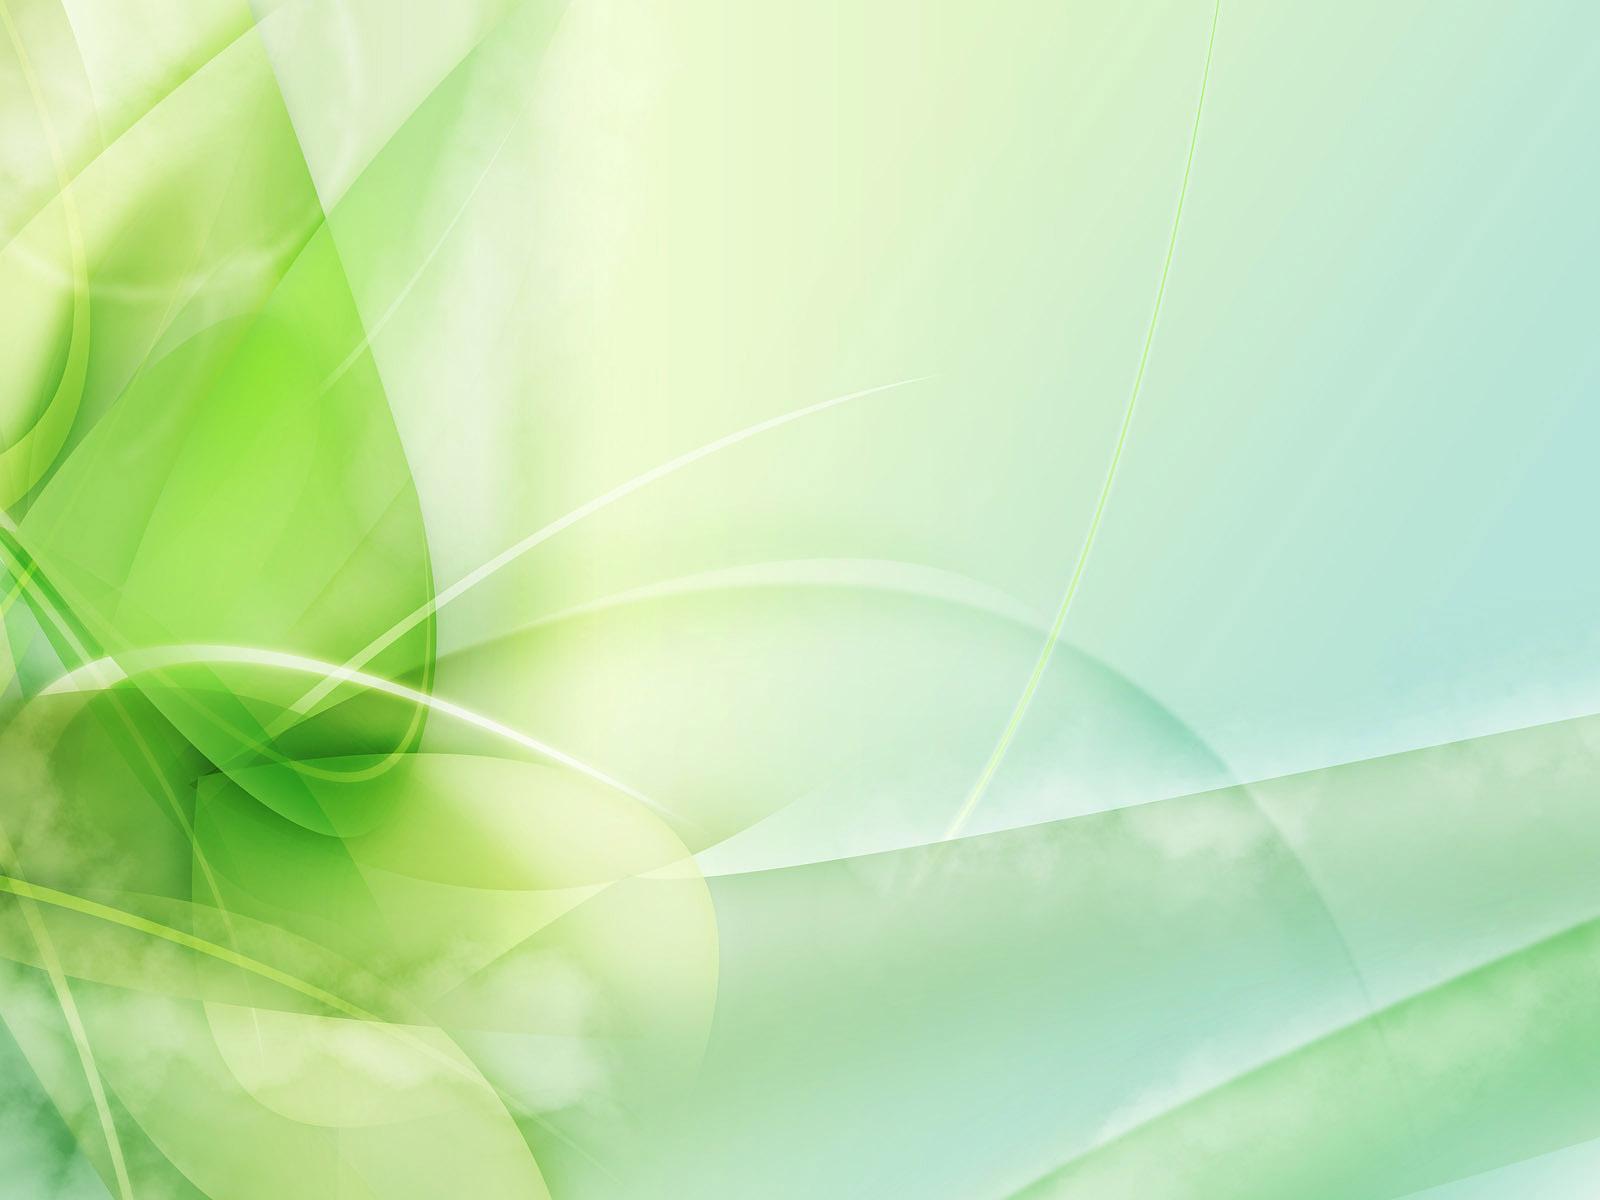 Light Green Background Wallpaper - WallpaperSafari